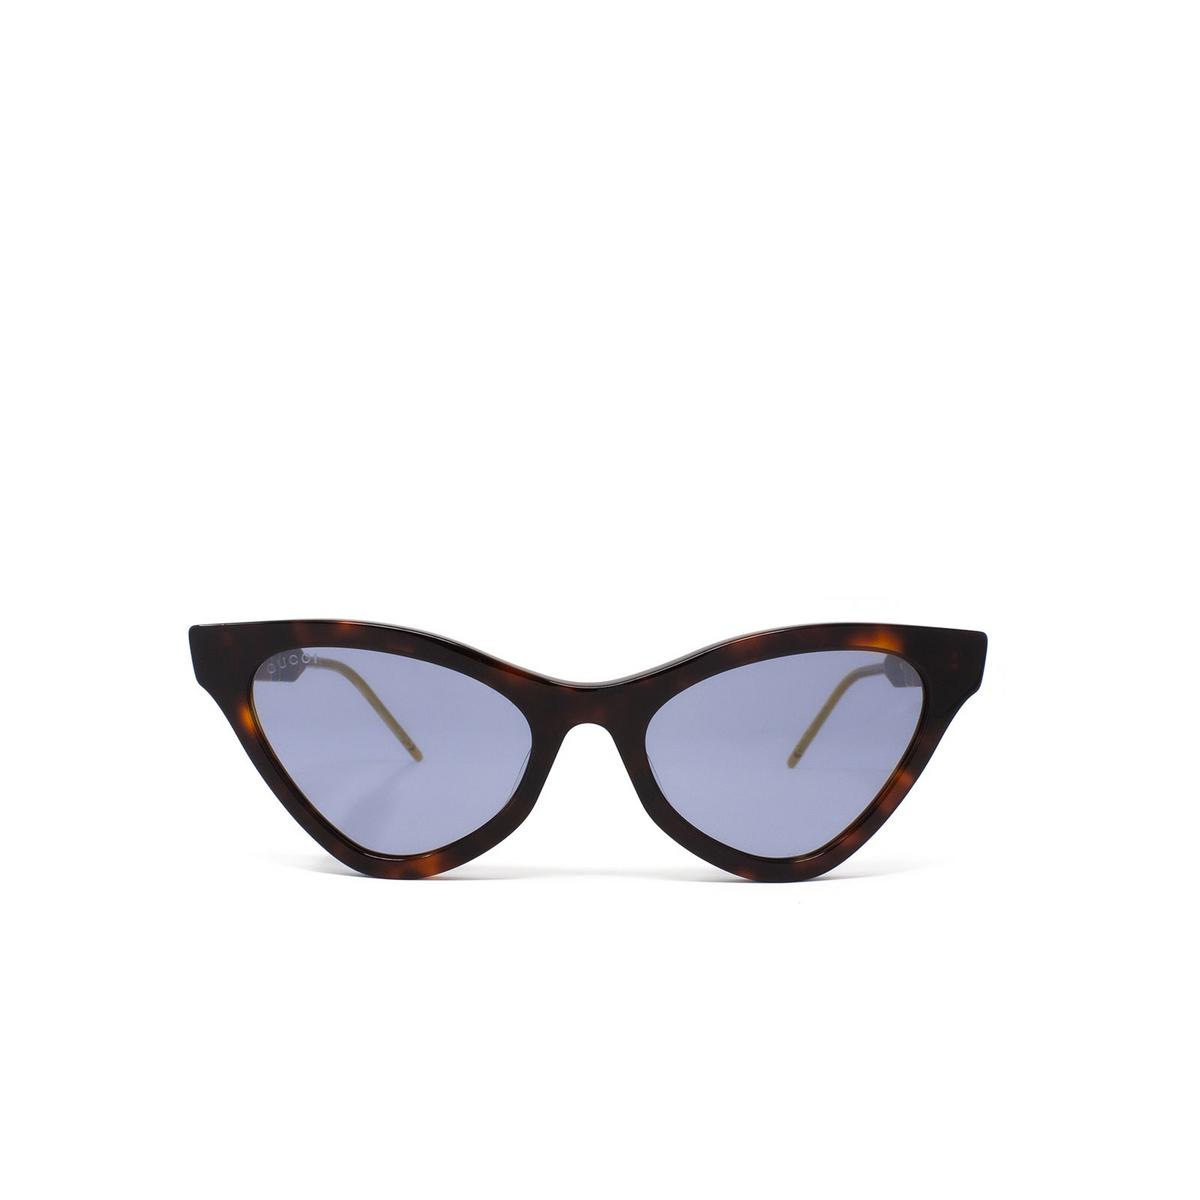 Gucci® Cat-eye Sunglasses: GG0597S color Havana 002 - 1/3.